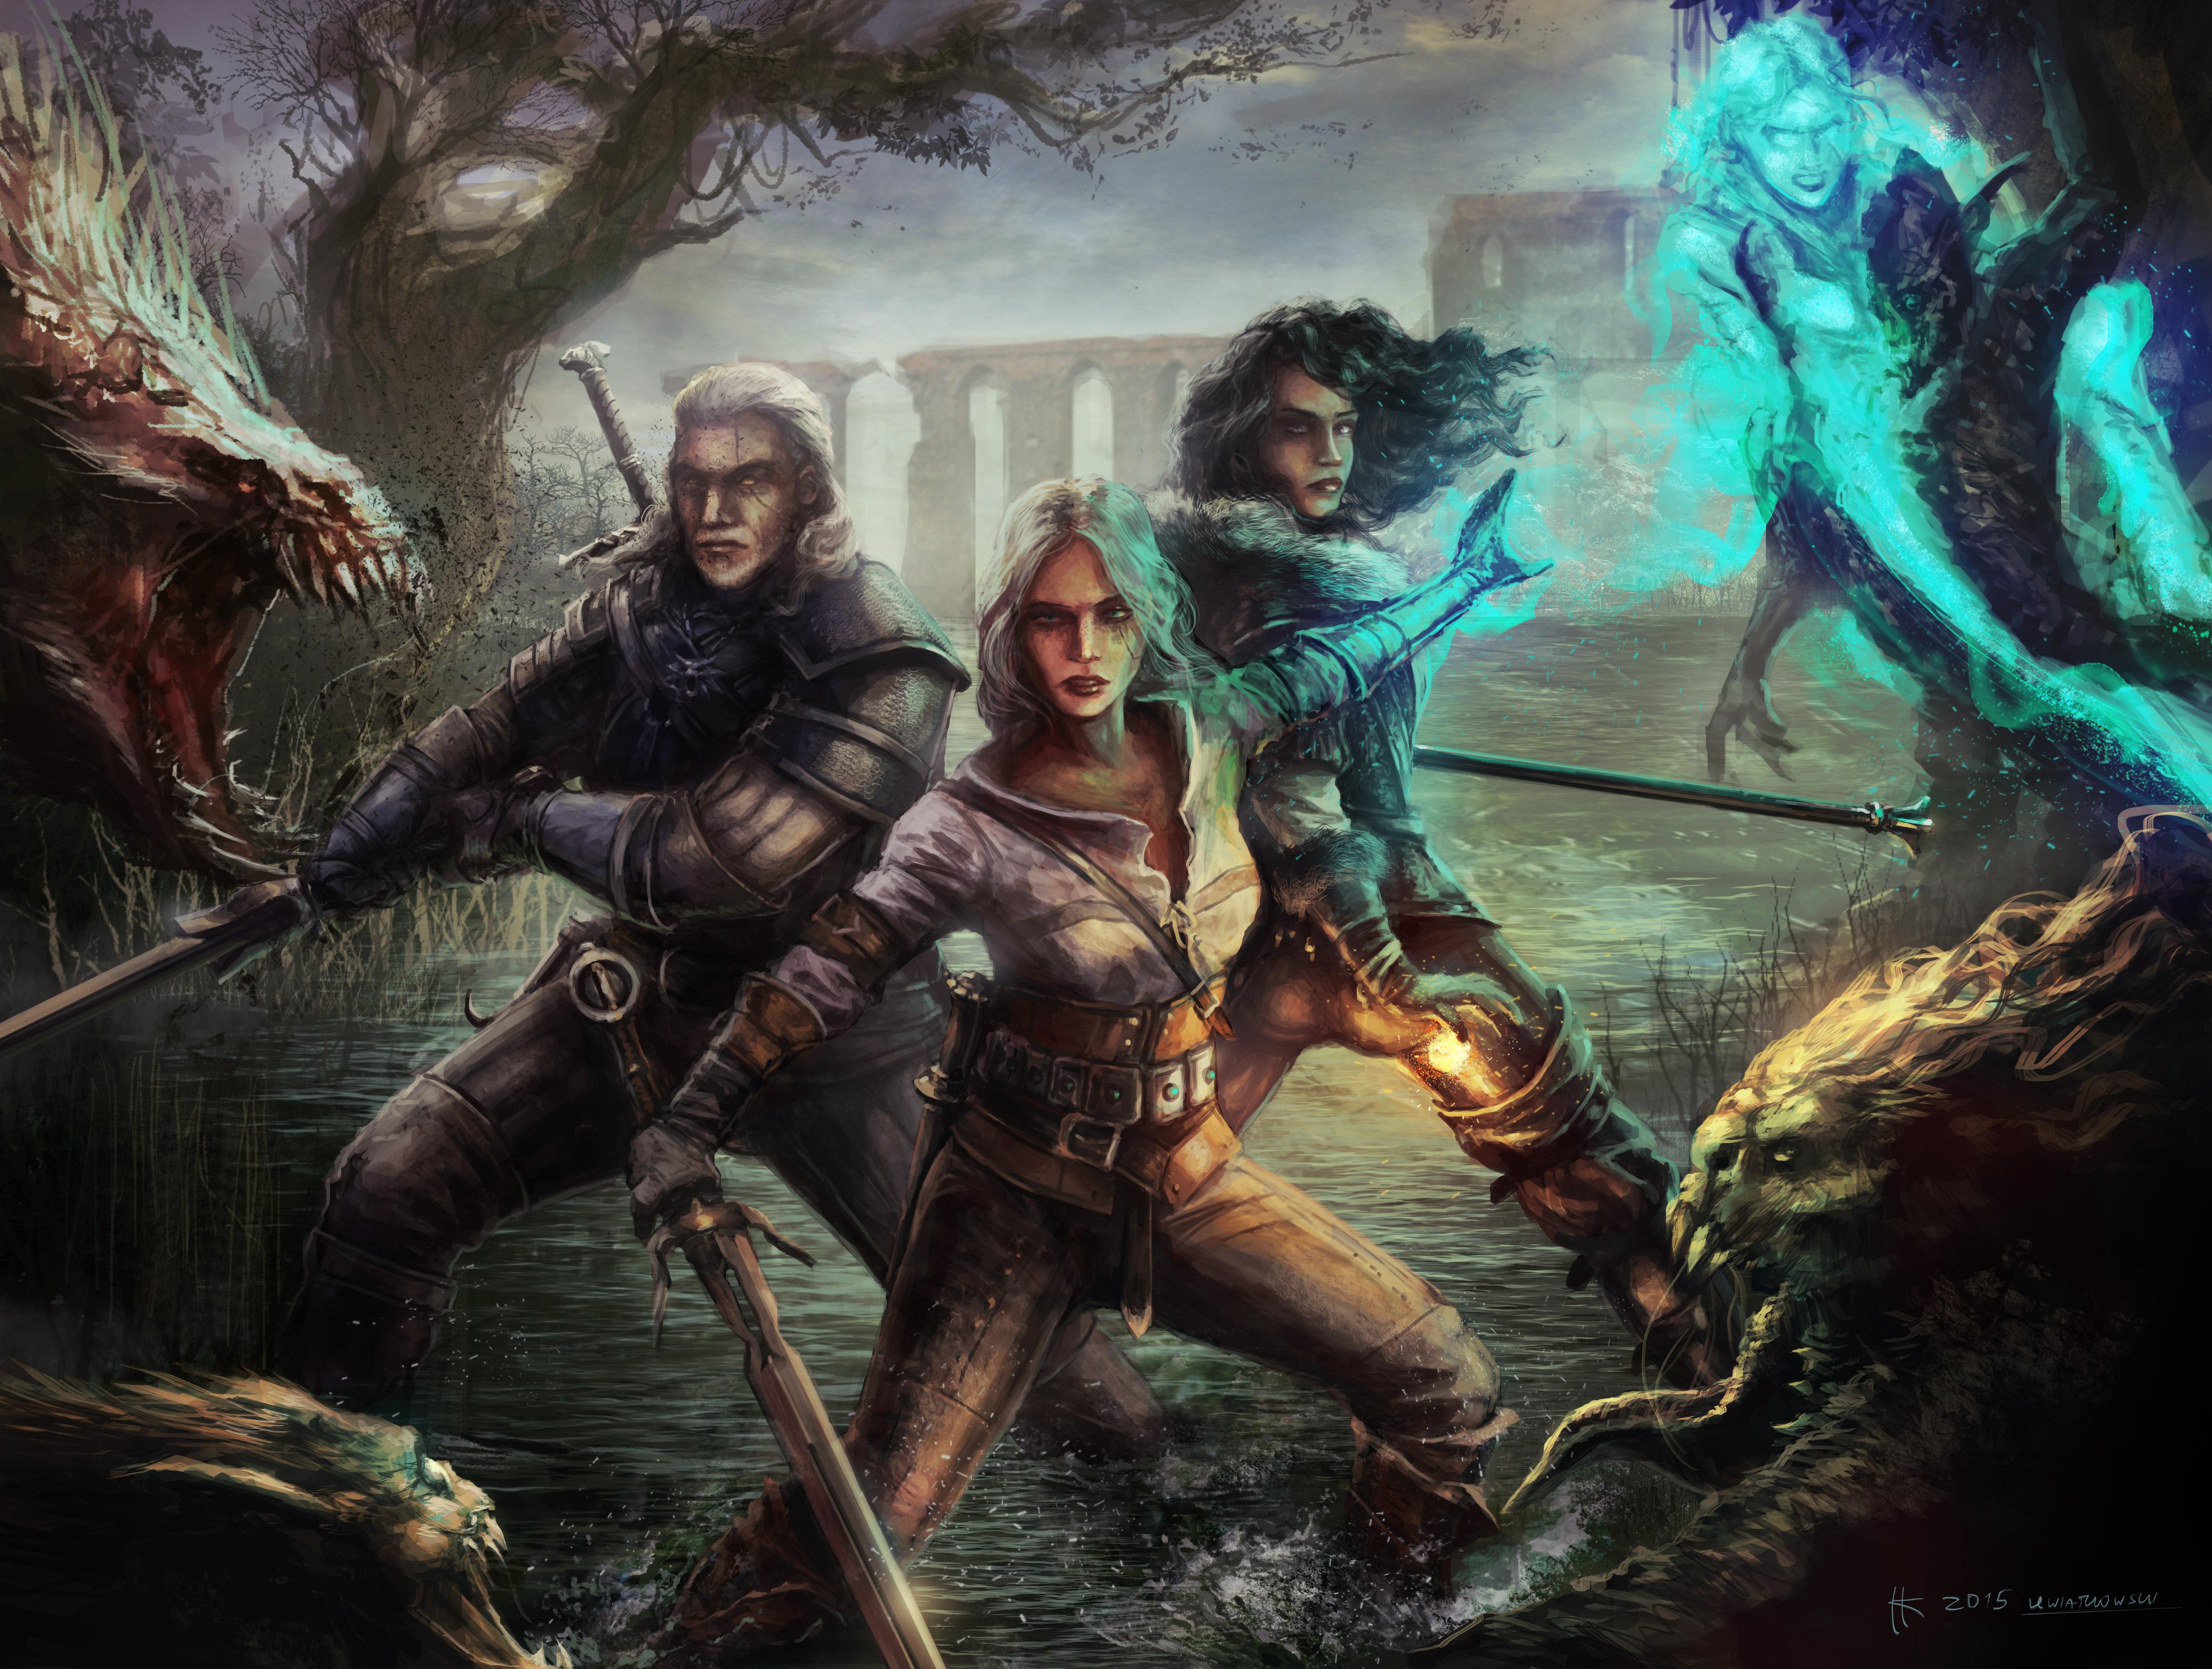 Witcher 3 wild hunt geralt yen and ciri hd games 4k - The witcher wallpaper 4k ...